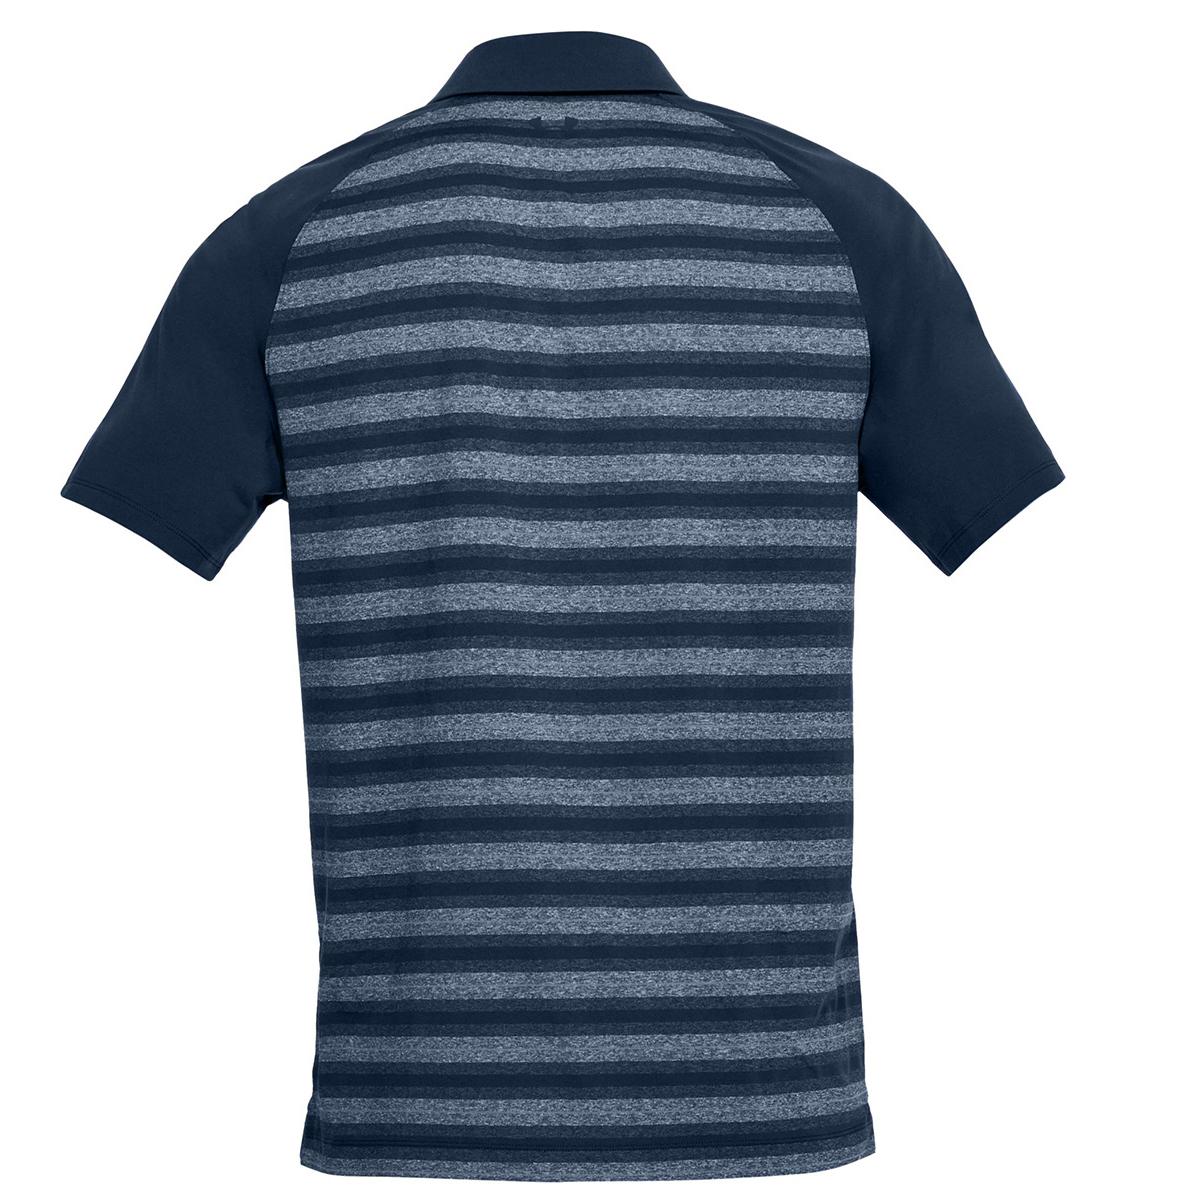 269d003a Under Armour Threadborne Boundless Polo Shirt from american golf